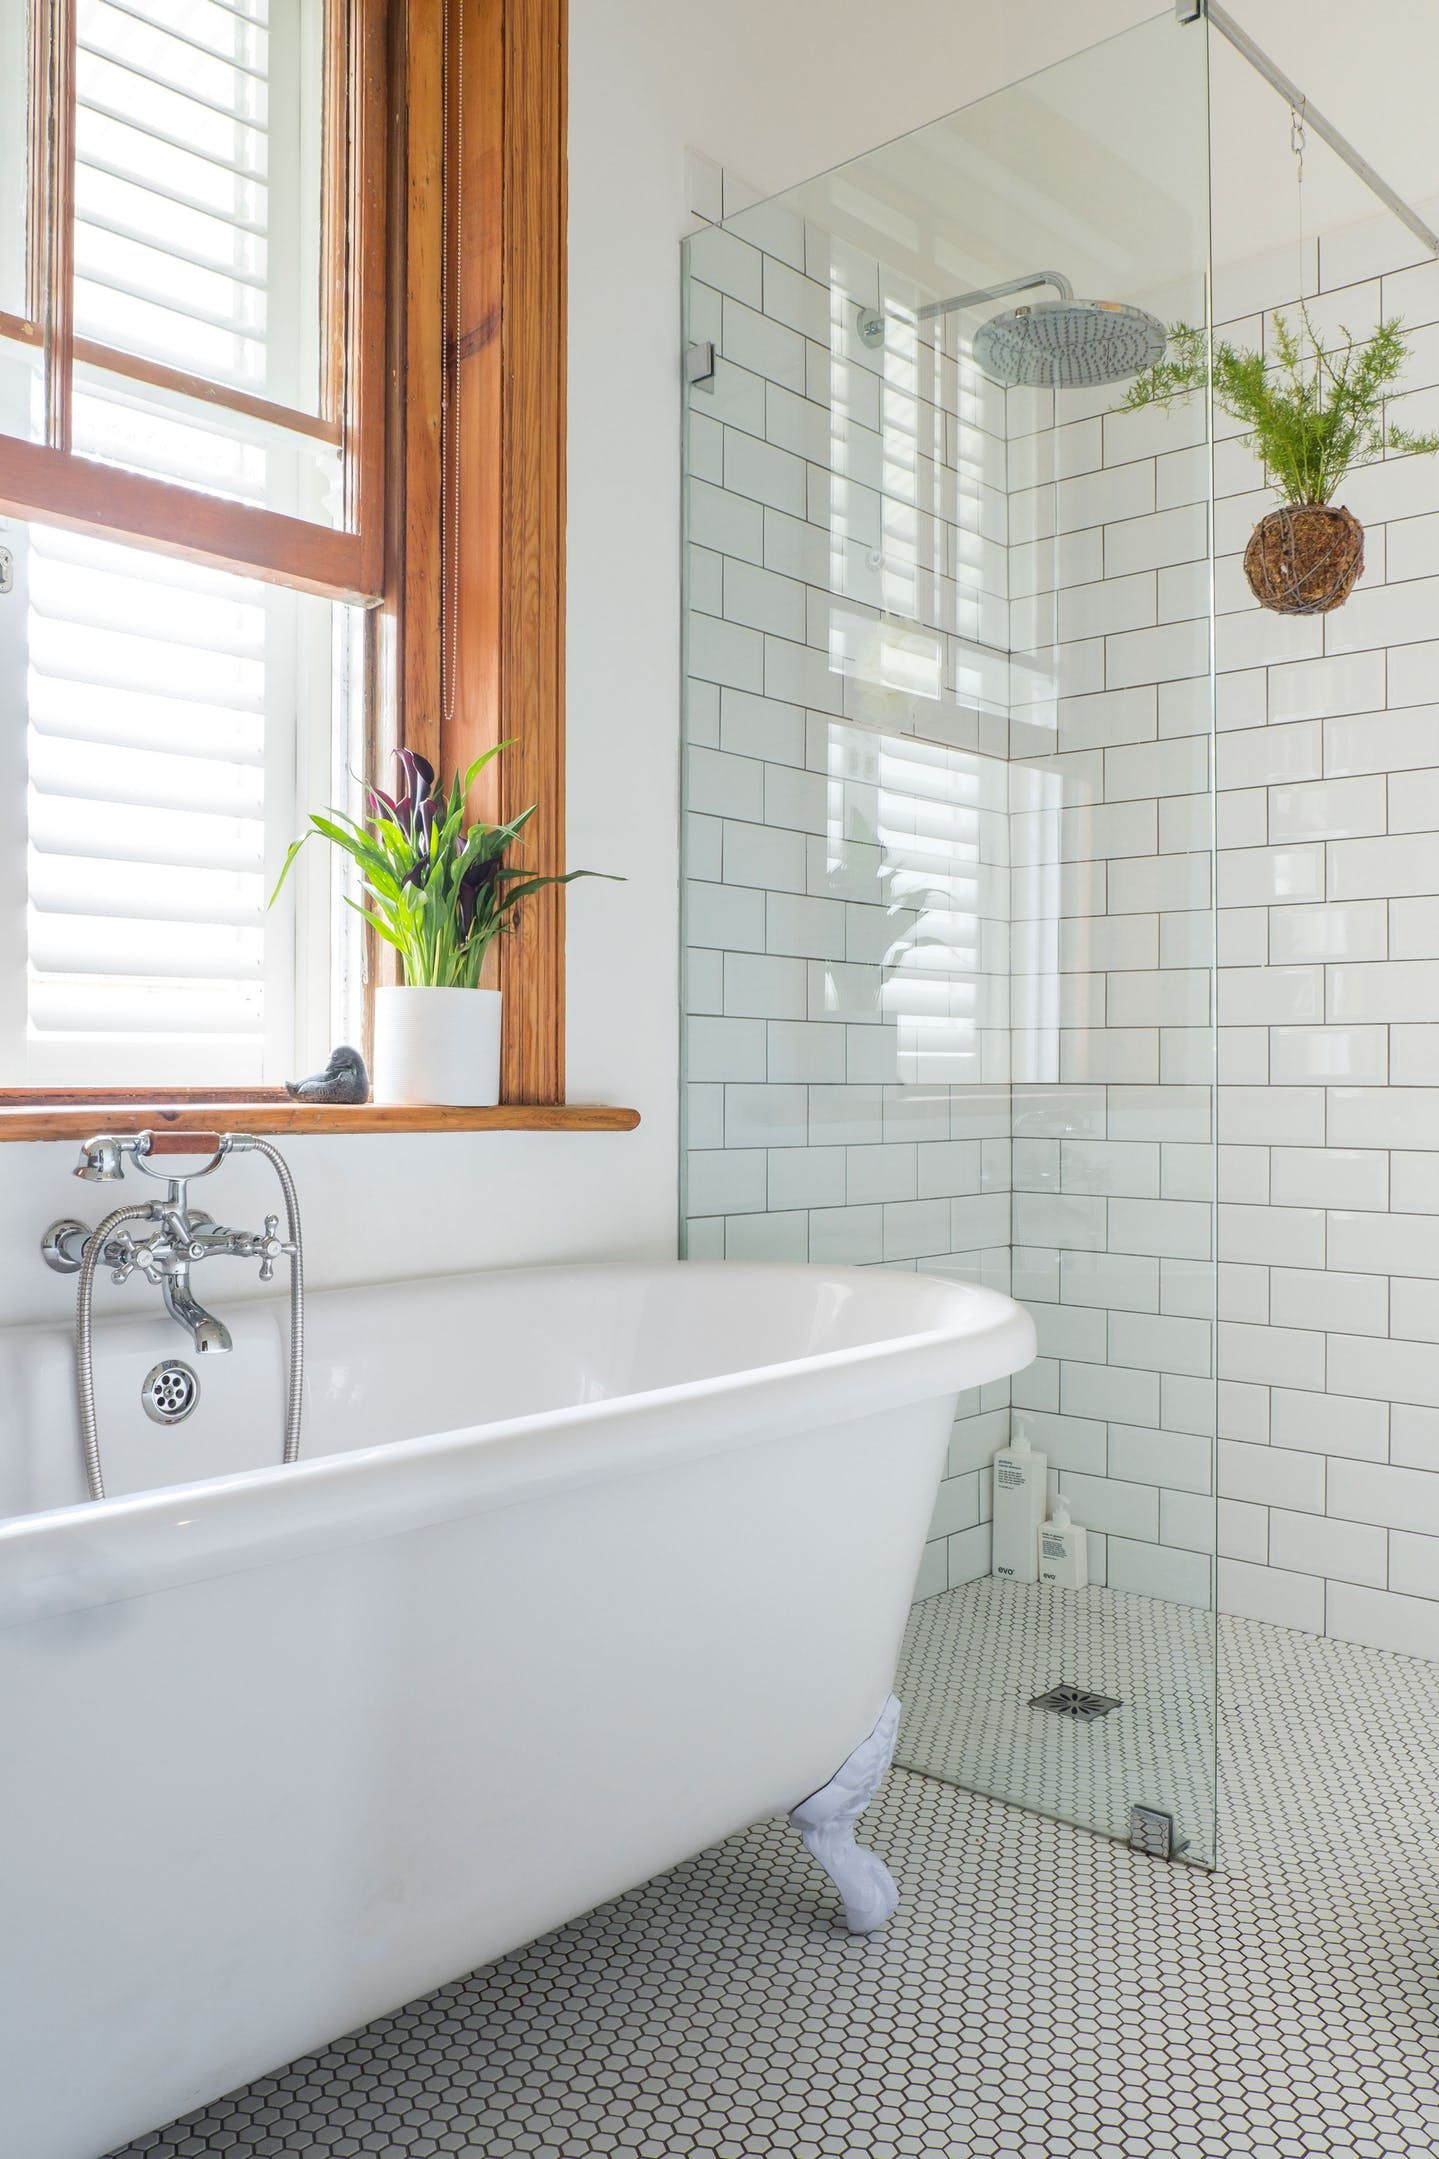 Miniature Artist Lorraine Loots Incredible Cape Town Home Bathroom Interior Design Minimalist Small Bathrooms Minimalist Bathroom